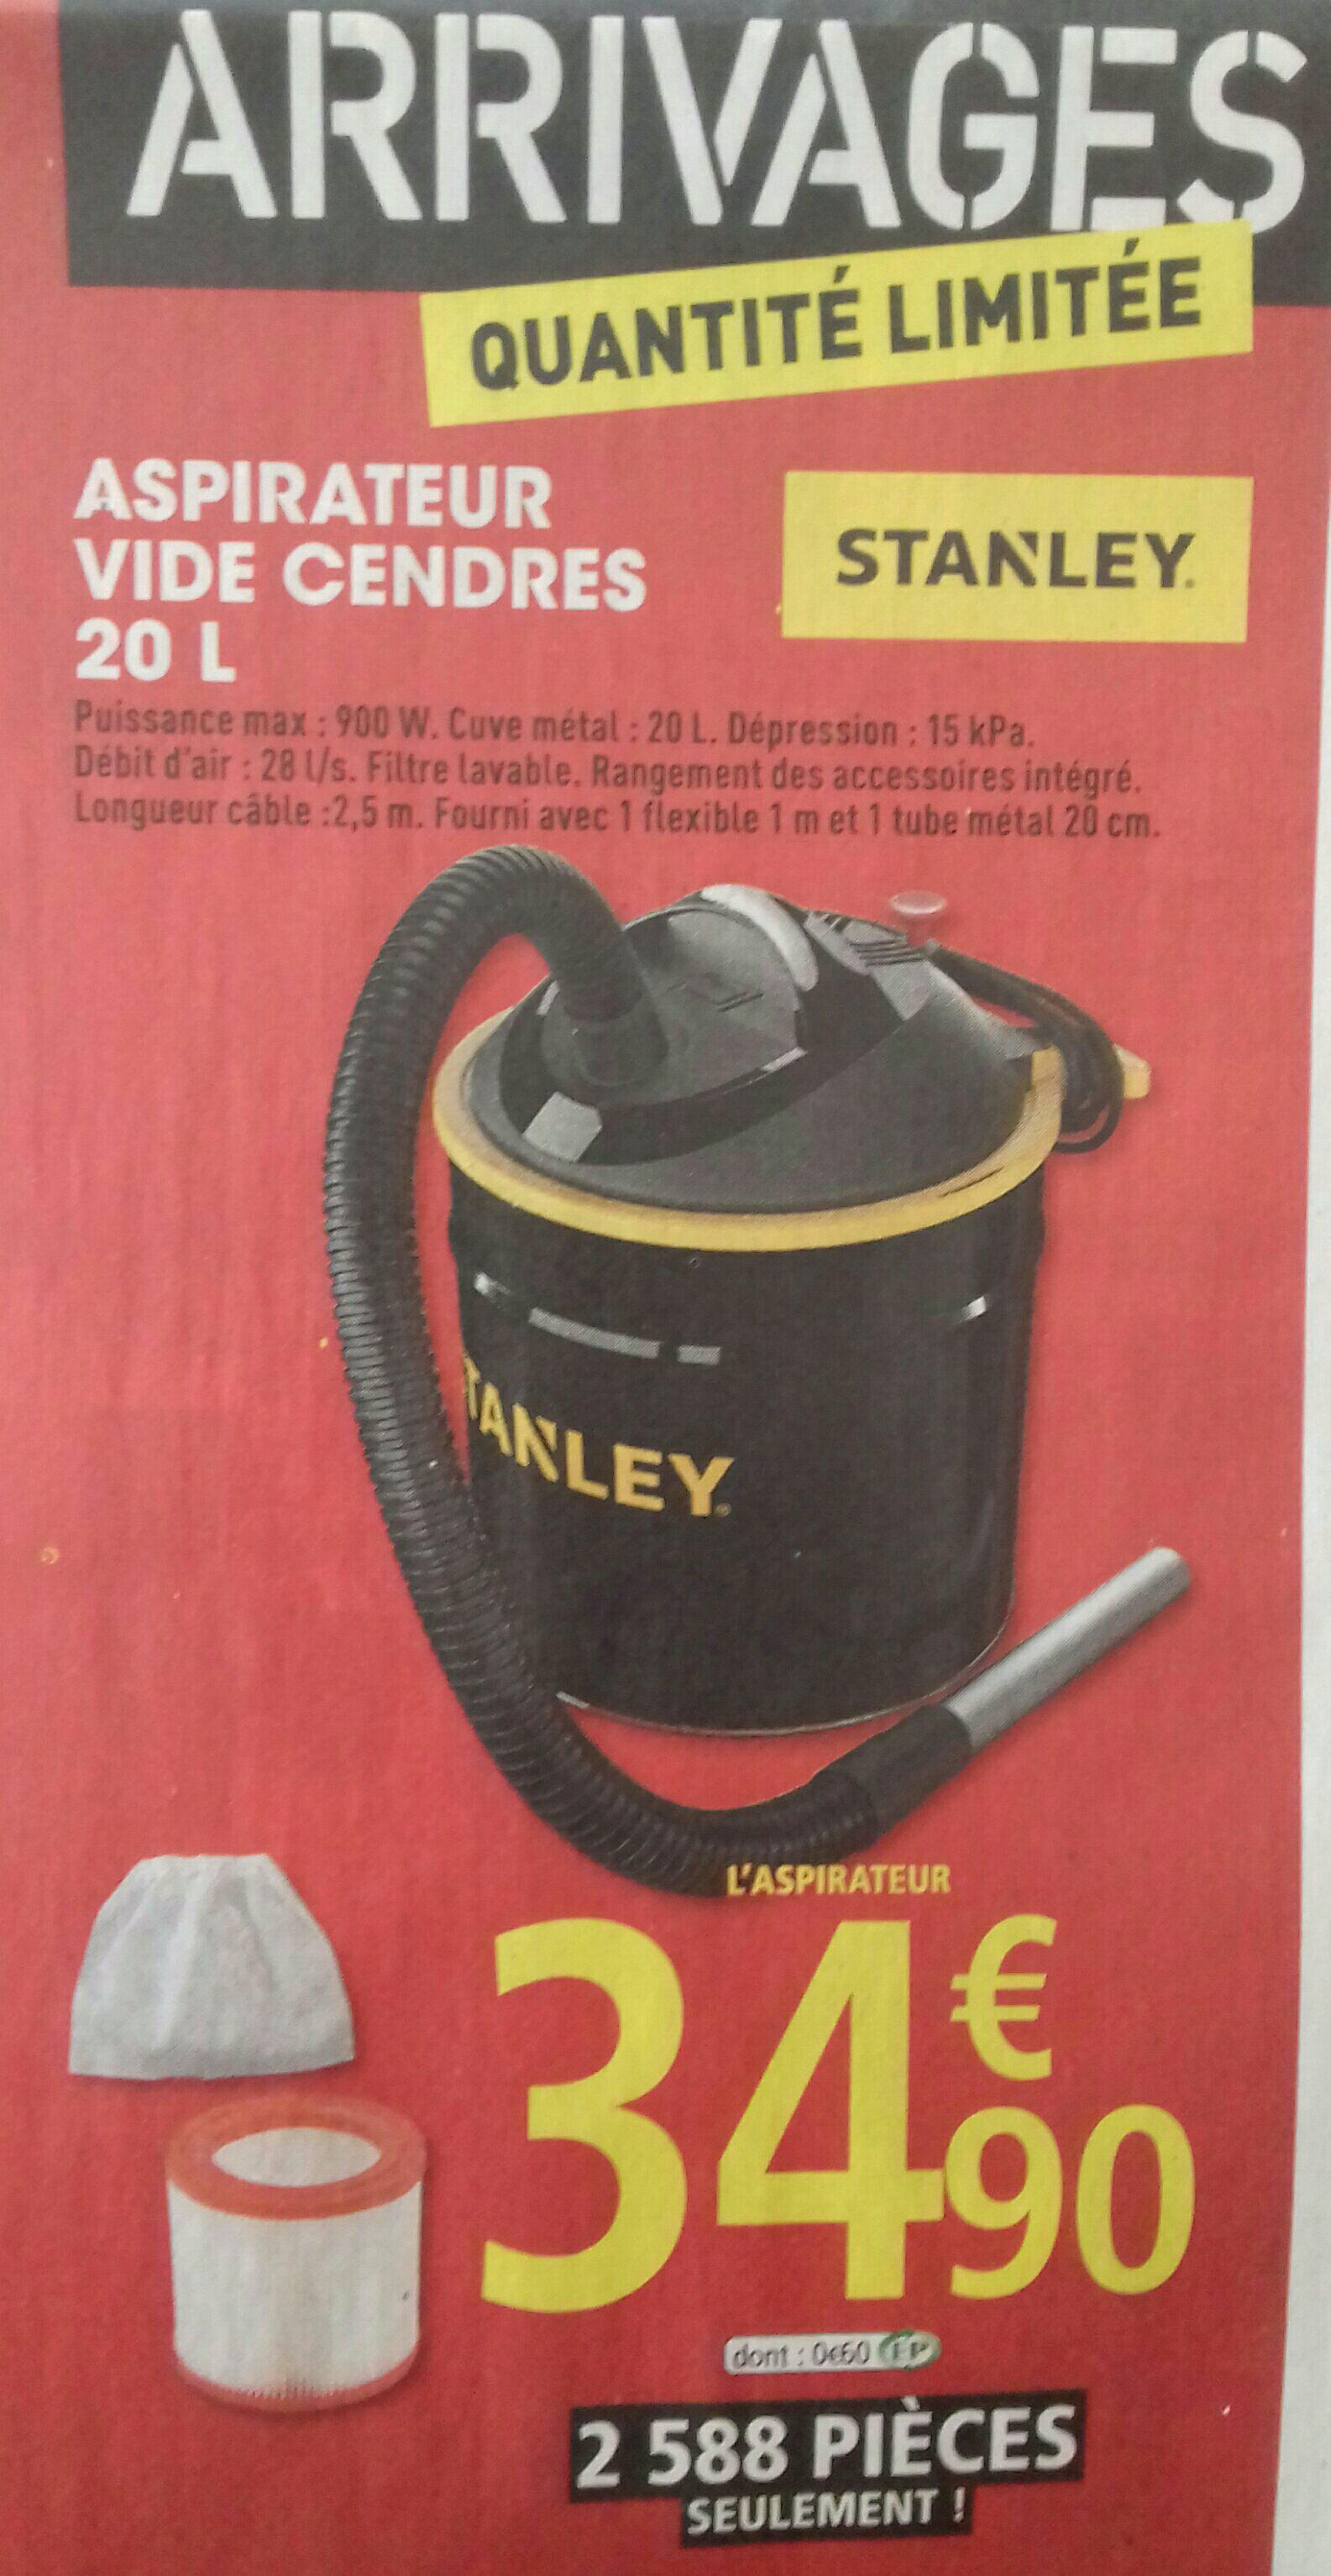 Aspirateur vide cendres STANLEY - 500W, 20L